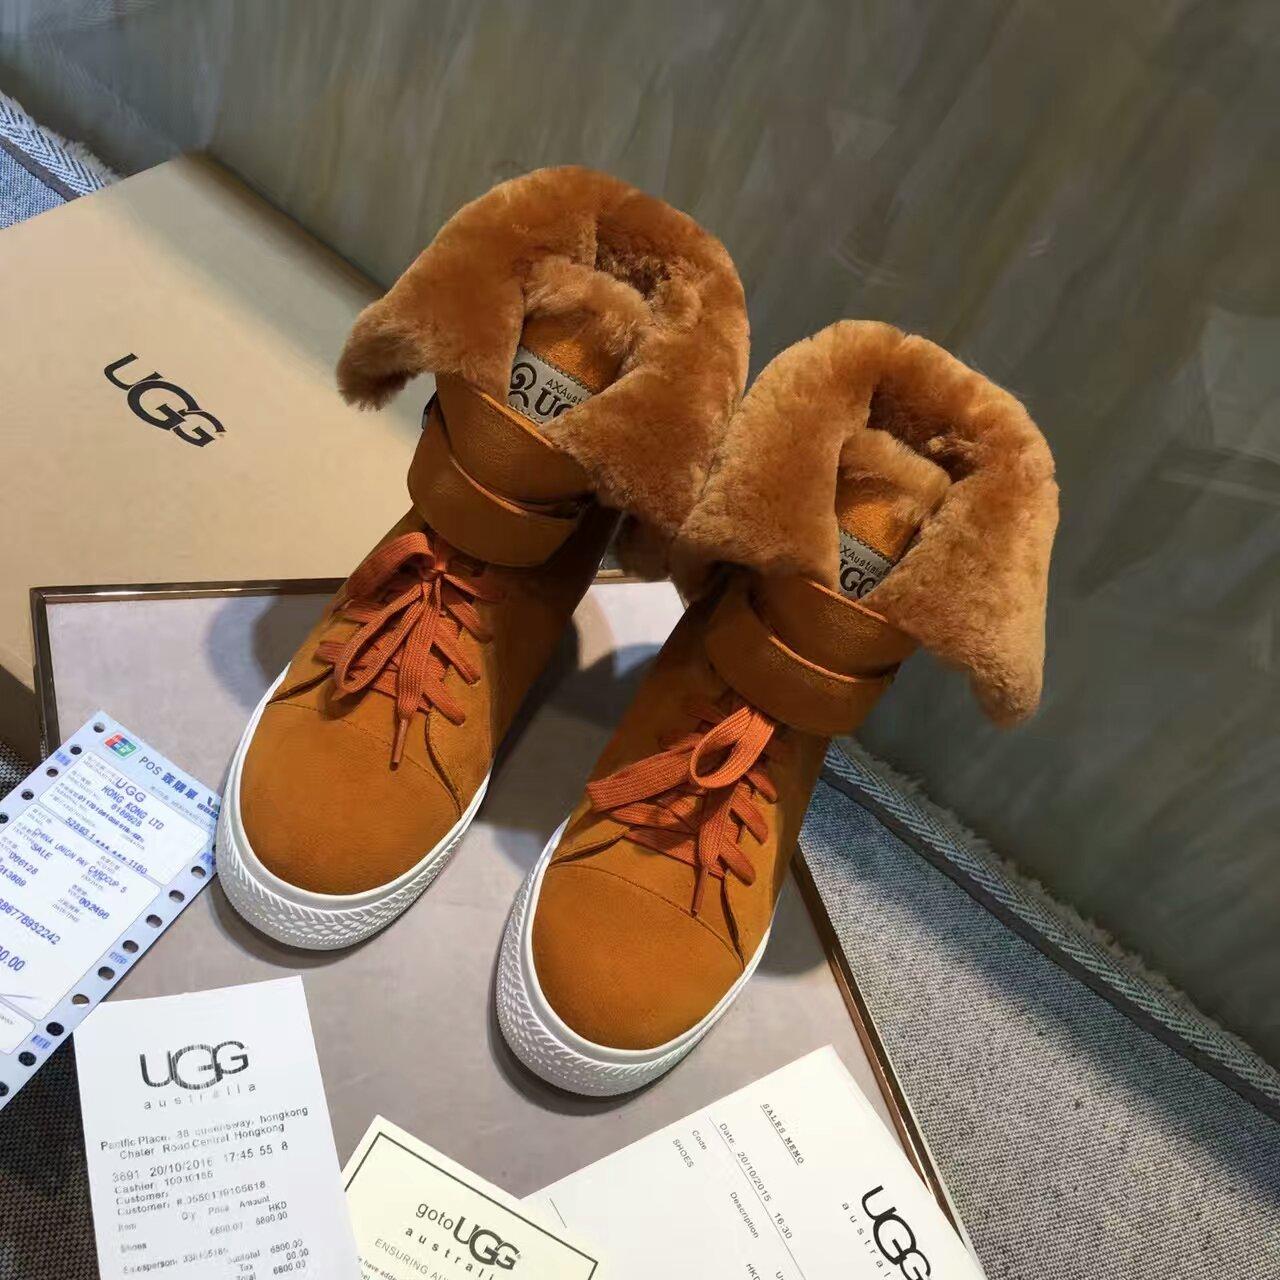 『UGG』2016年冬季新款短靴 此款使经典的舒适感达到最高峰